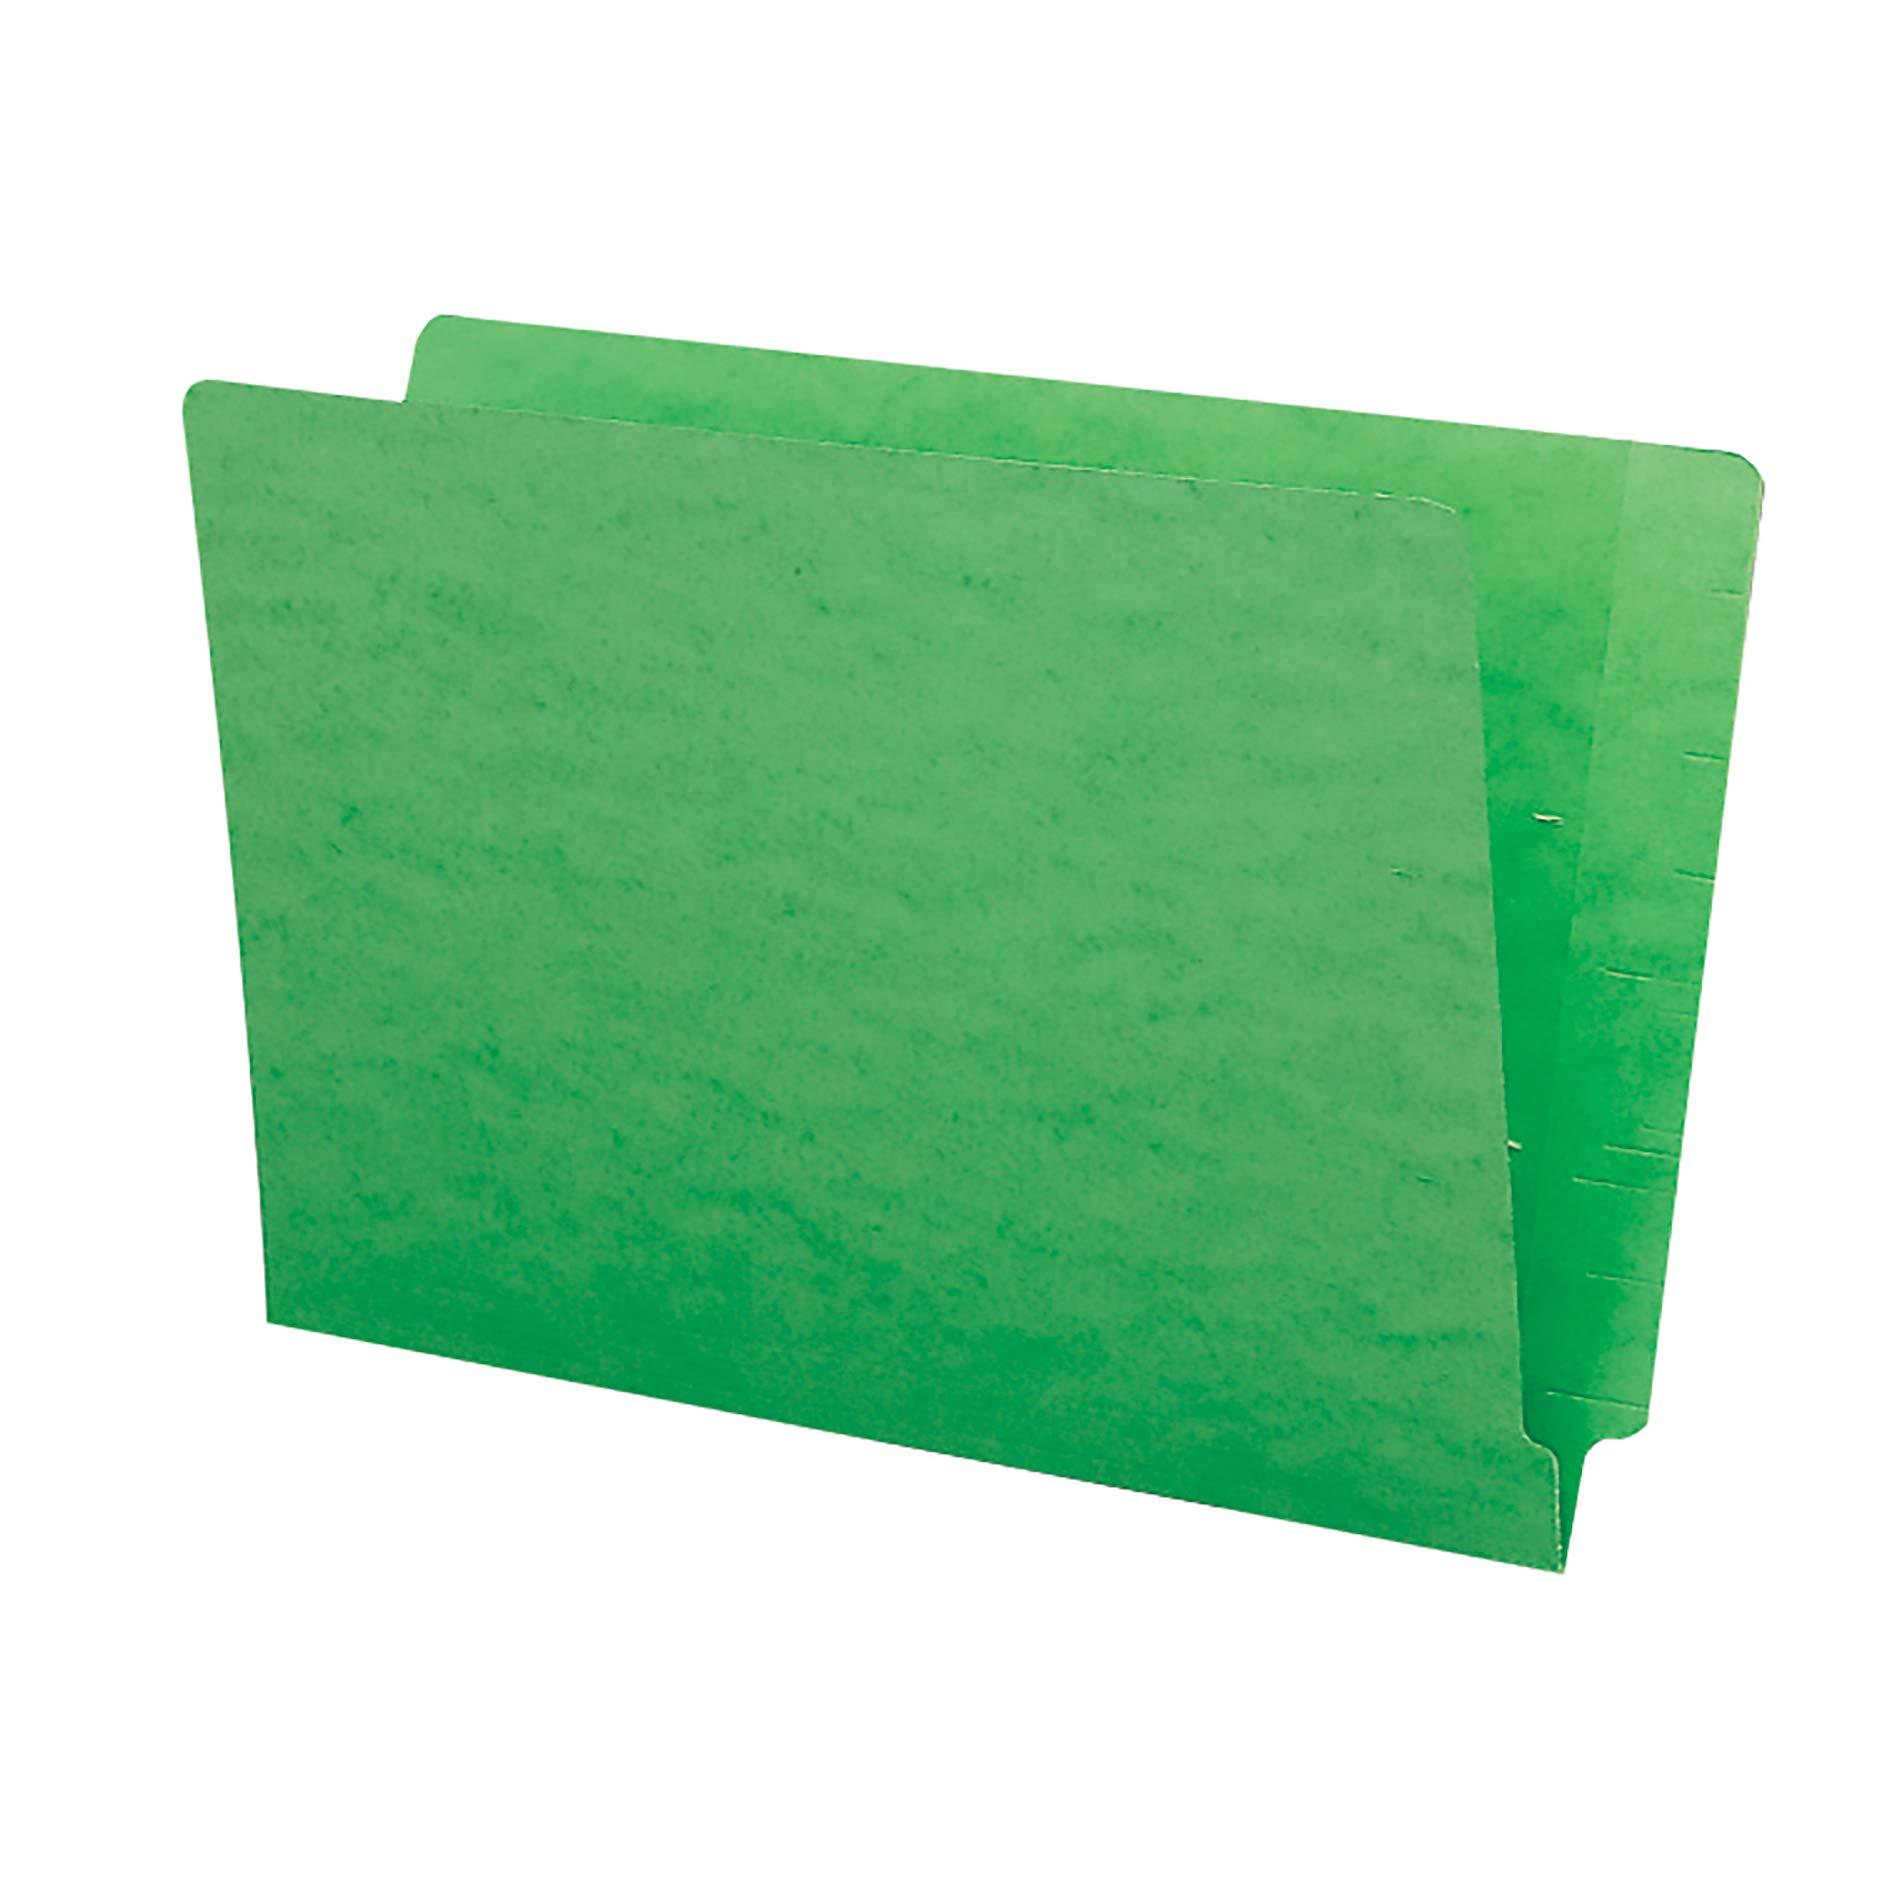 Smead End Tab File Folder, Shelf-Master Reinforced Straight-Cut Tab, Legal Size, Green, 100 per Box (28110) by Smead